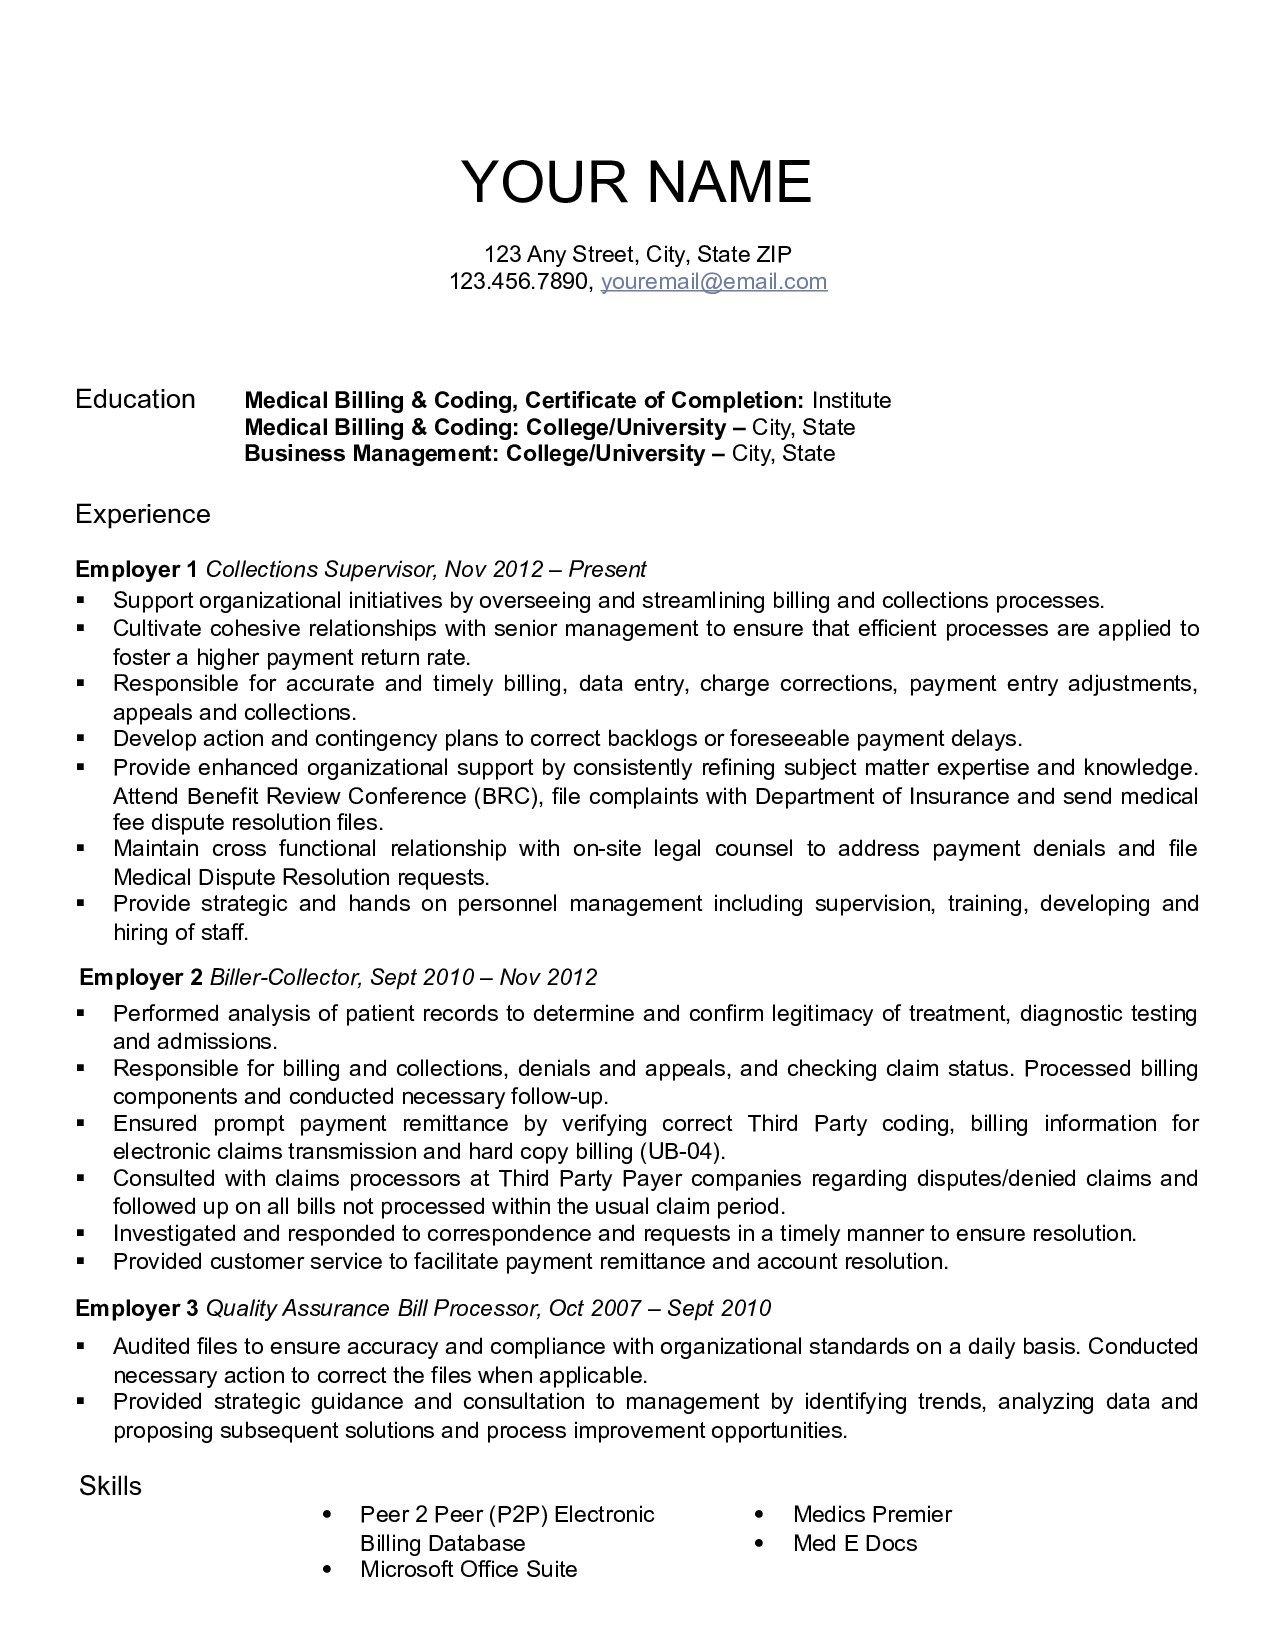 resume examples medical billing